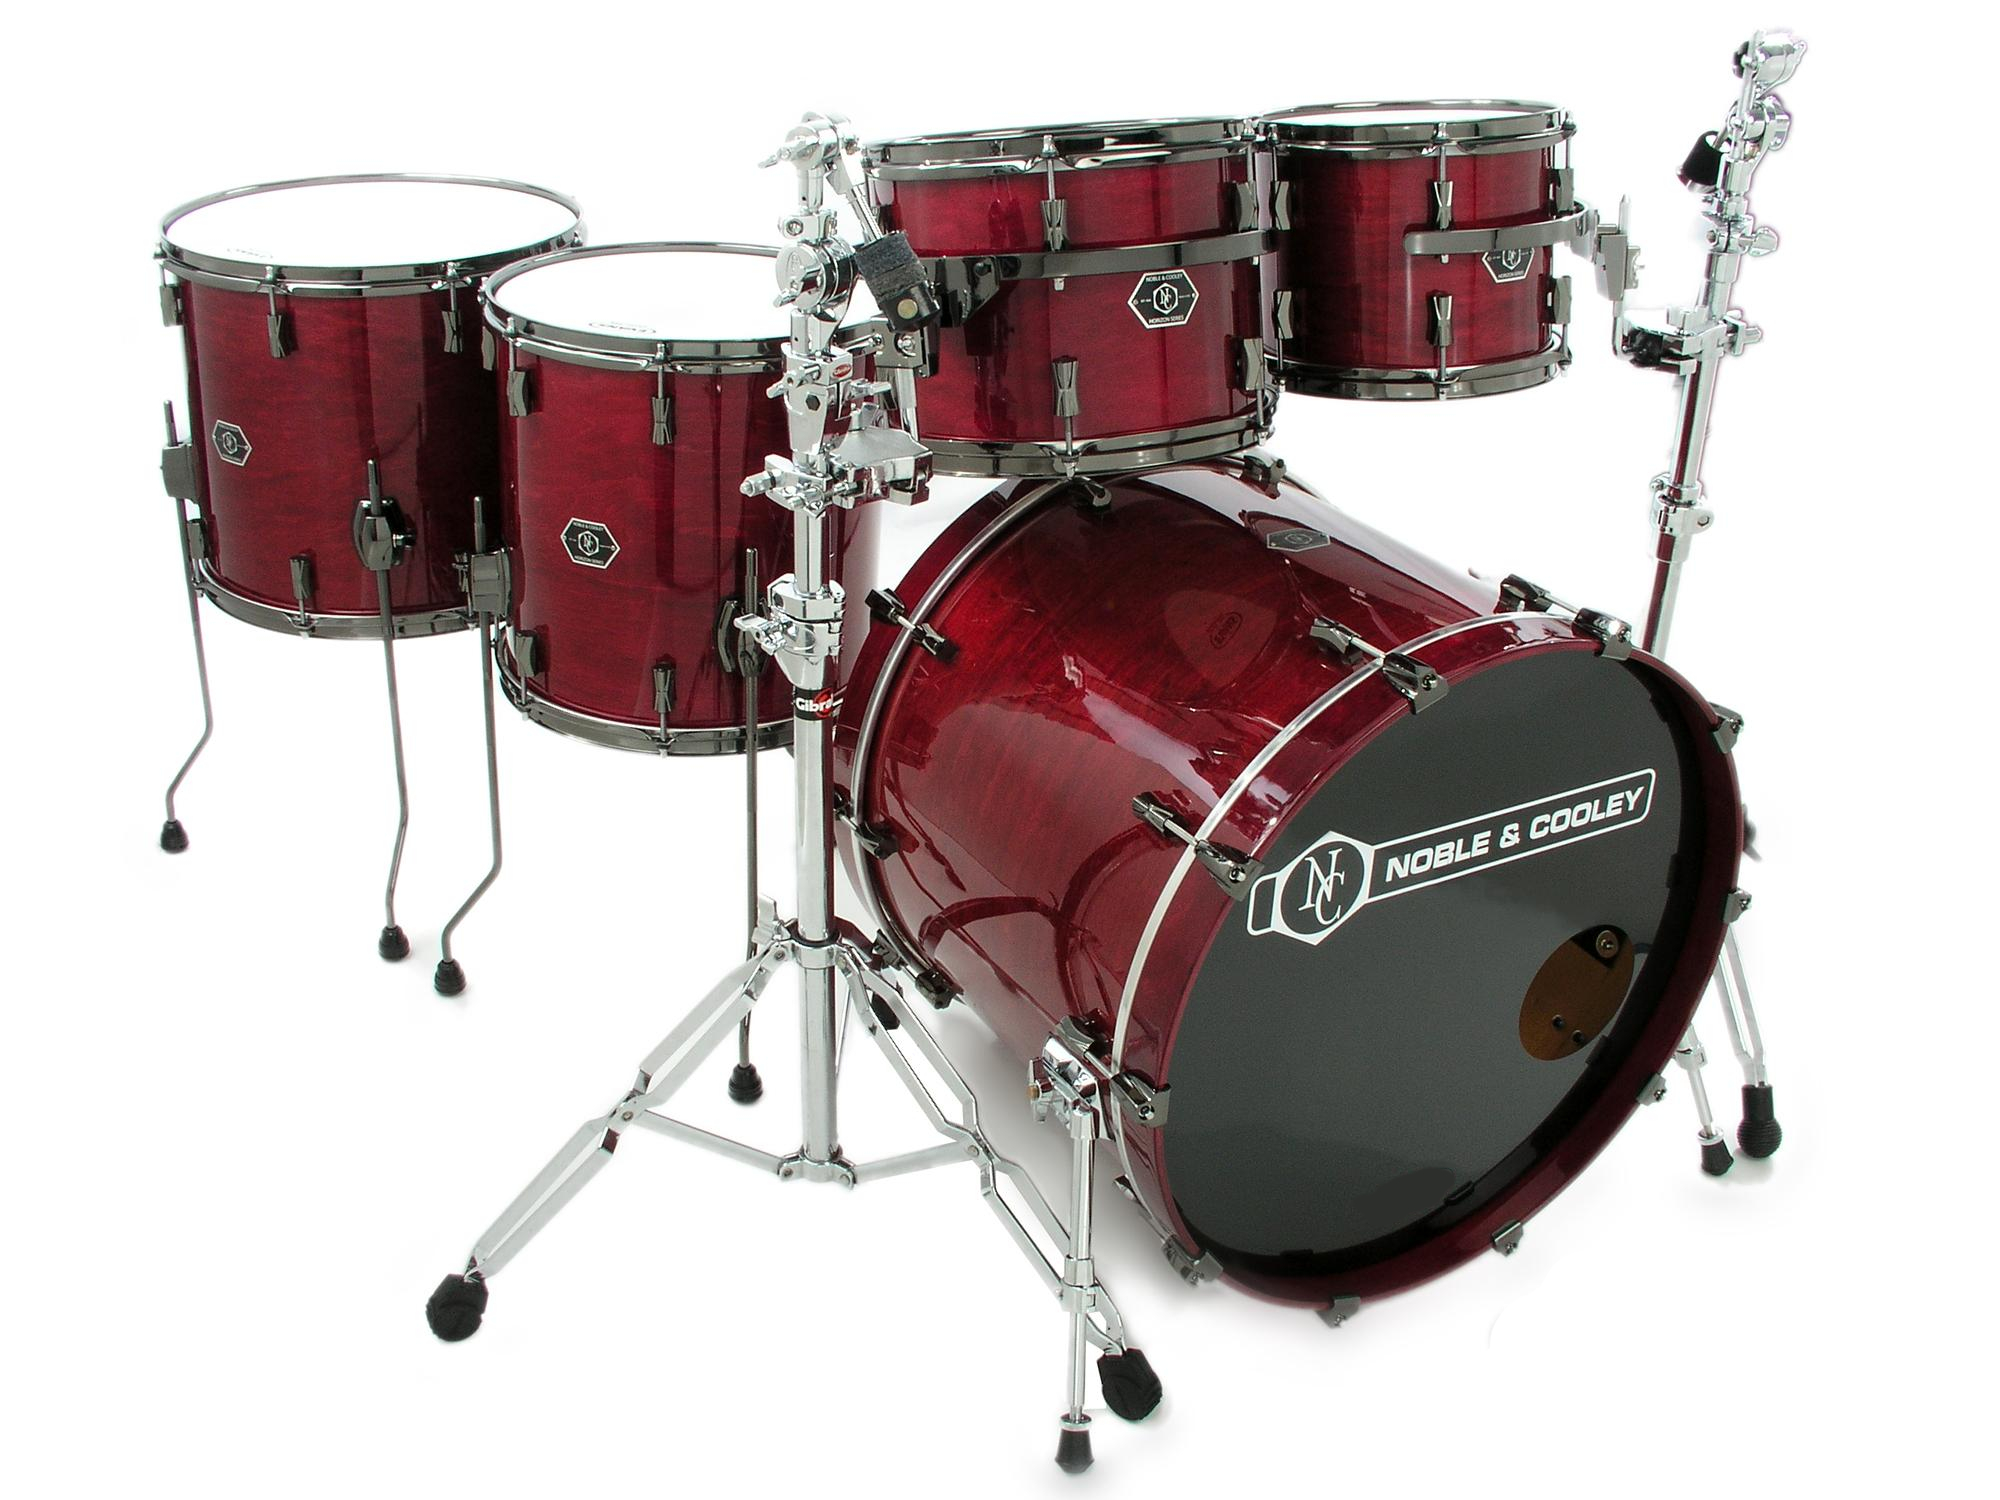 -15469-15469-noble-cooley-5pc-horizon-drum-set-dark-cherry-gloss-black-15353213206-57